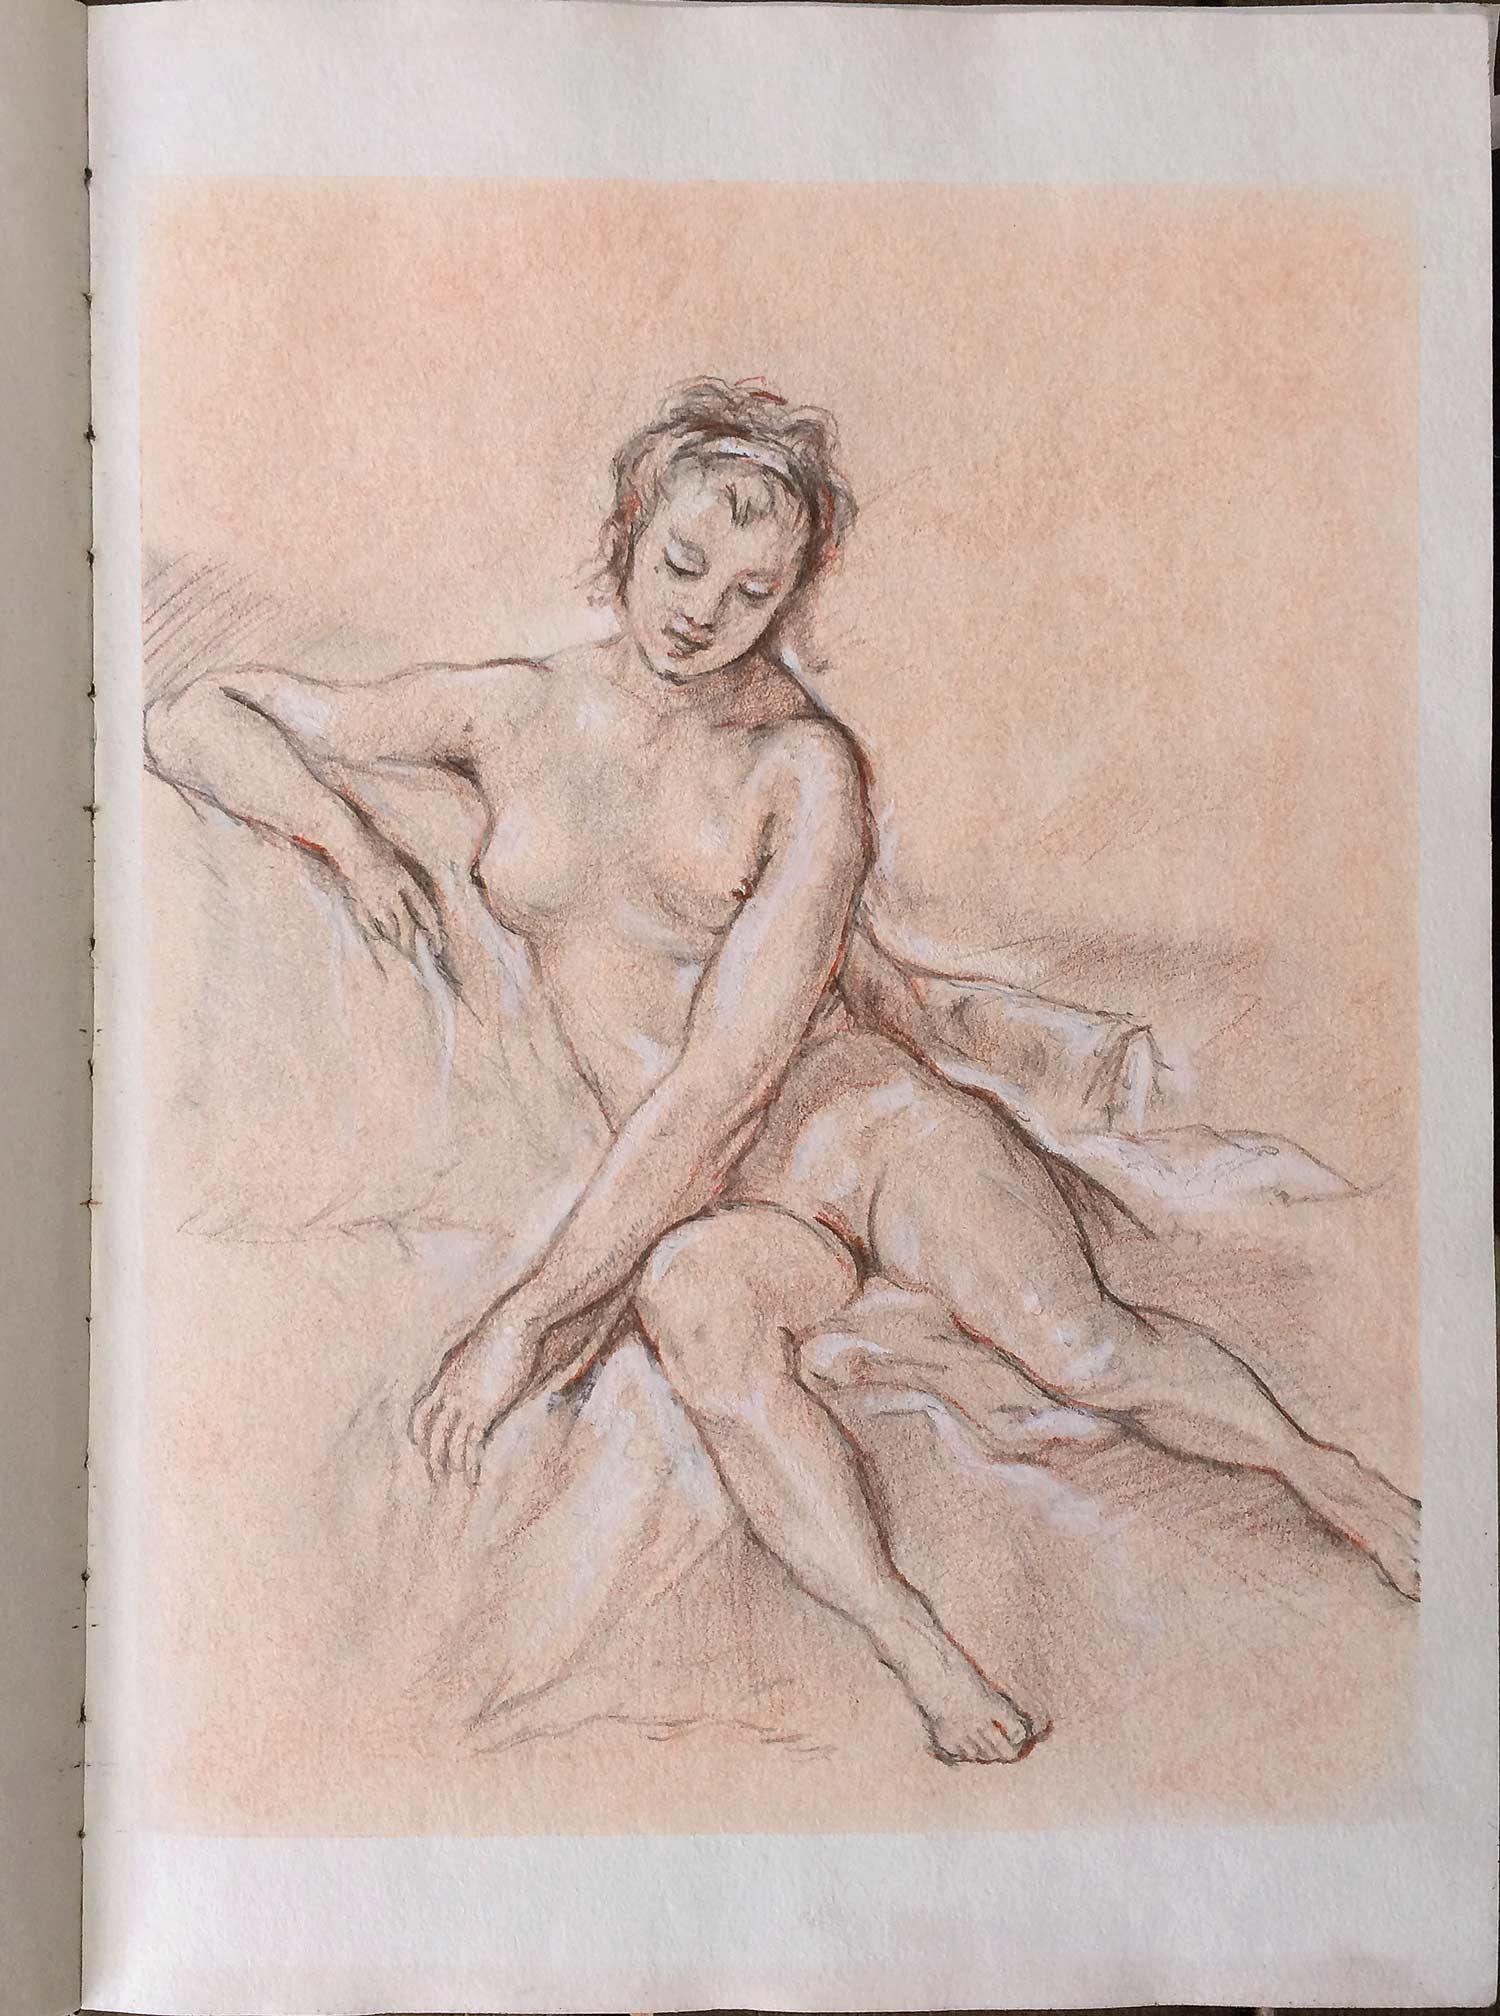 Image-result-for-francois-boucher-une-femme-assise-nue-François-Boucher,-Femme-assise-nue.jpg